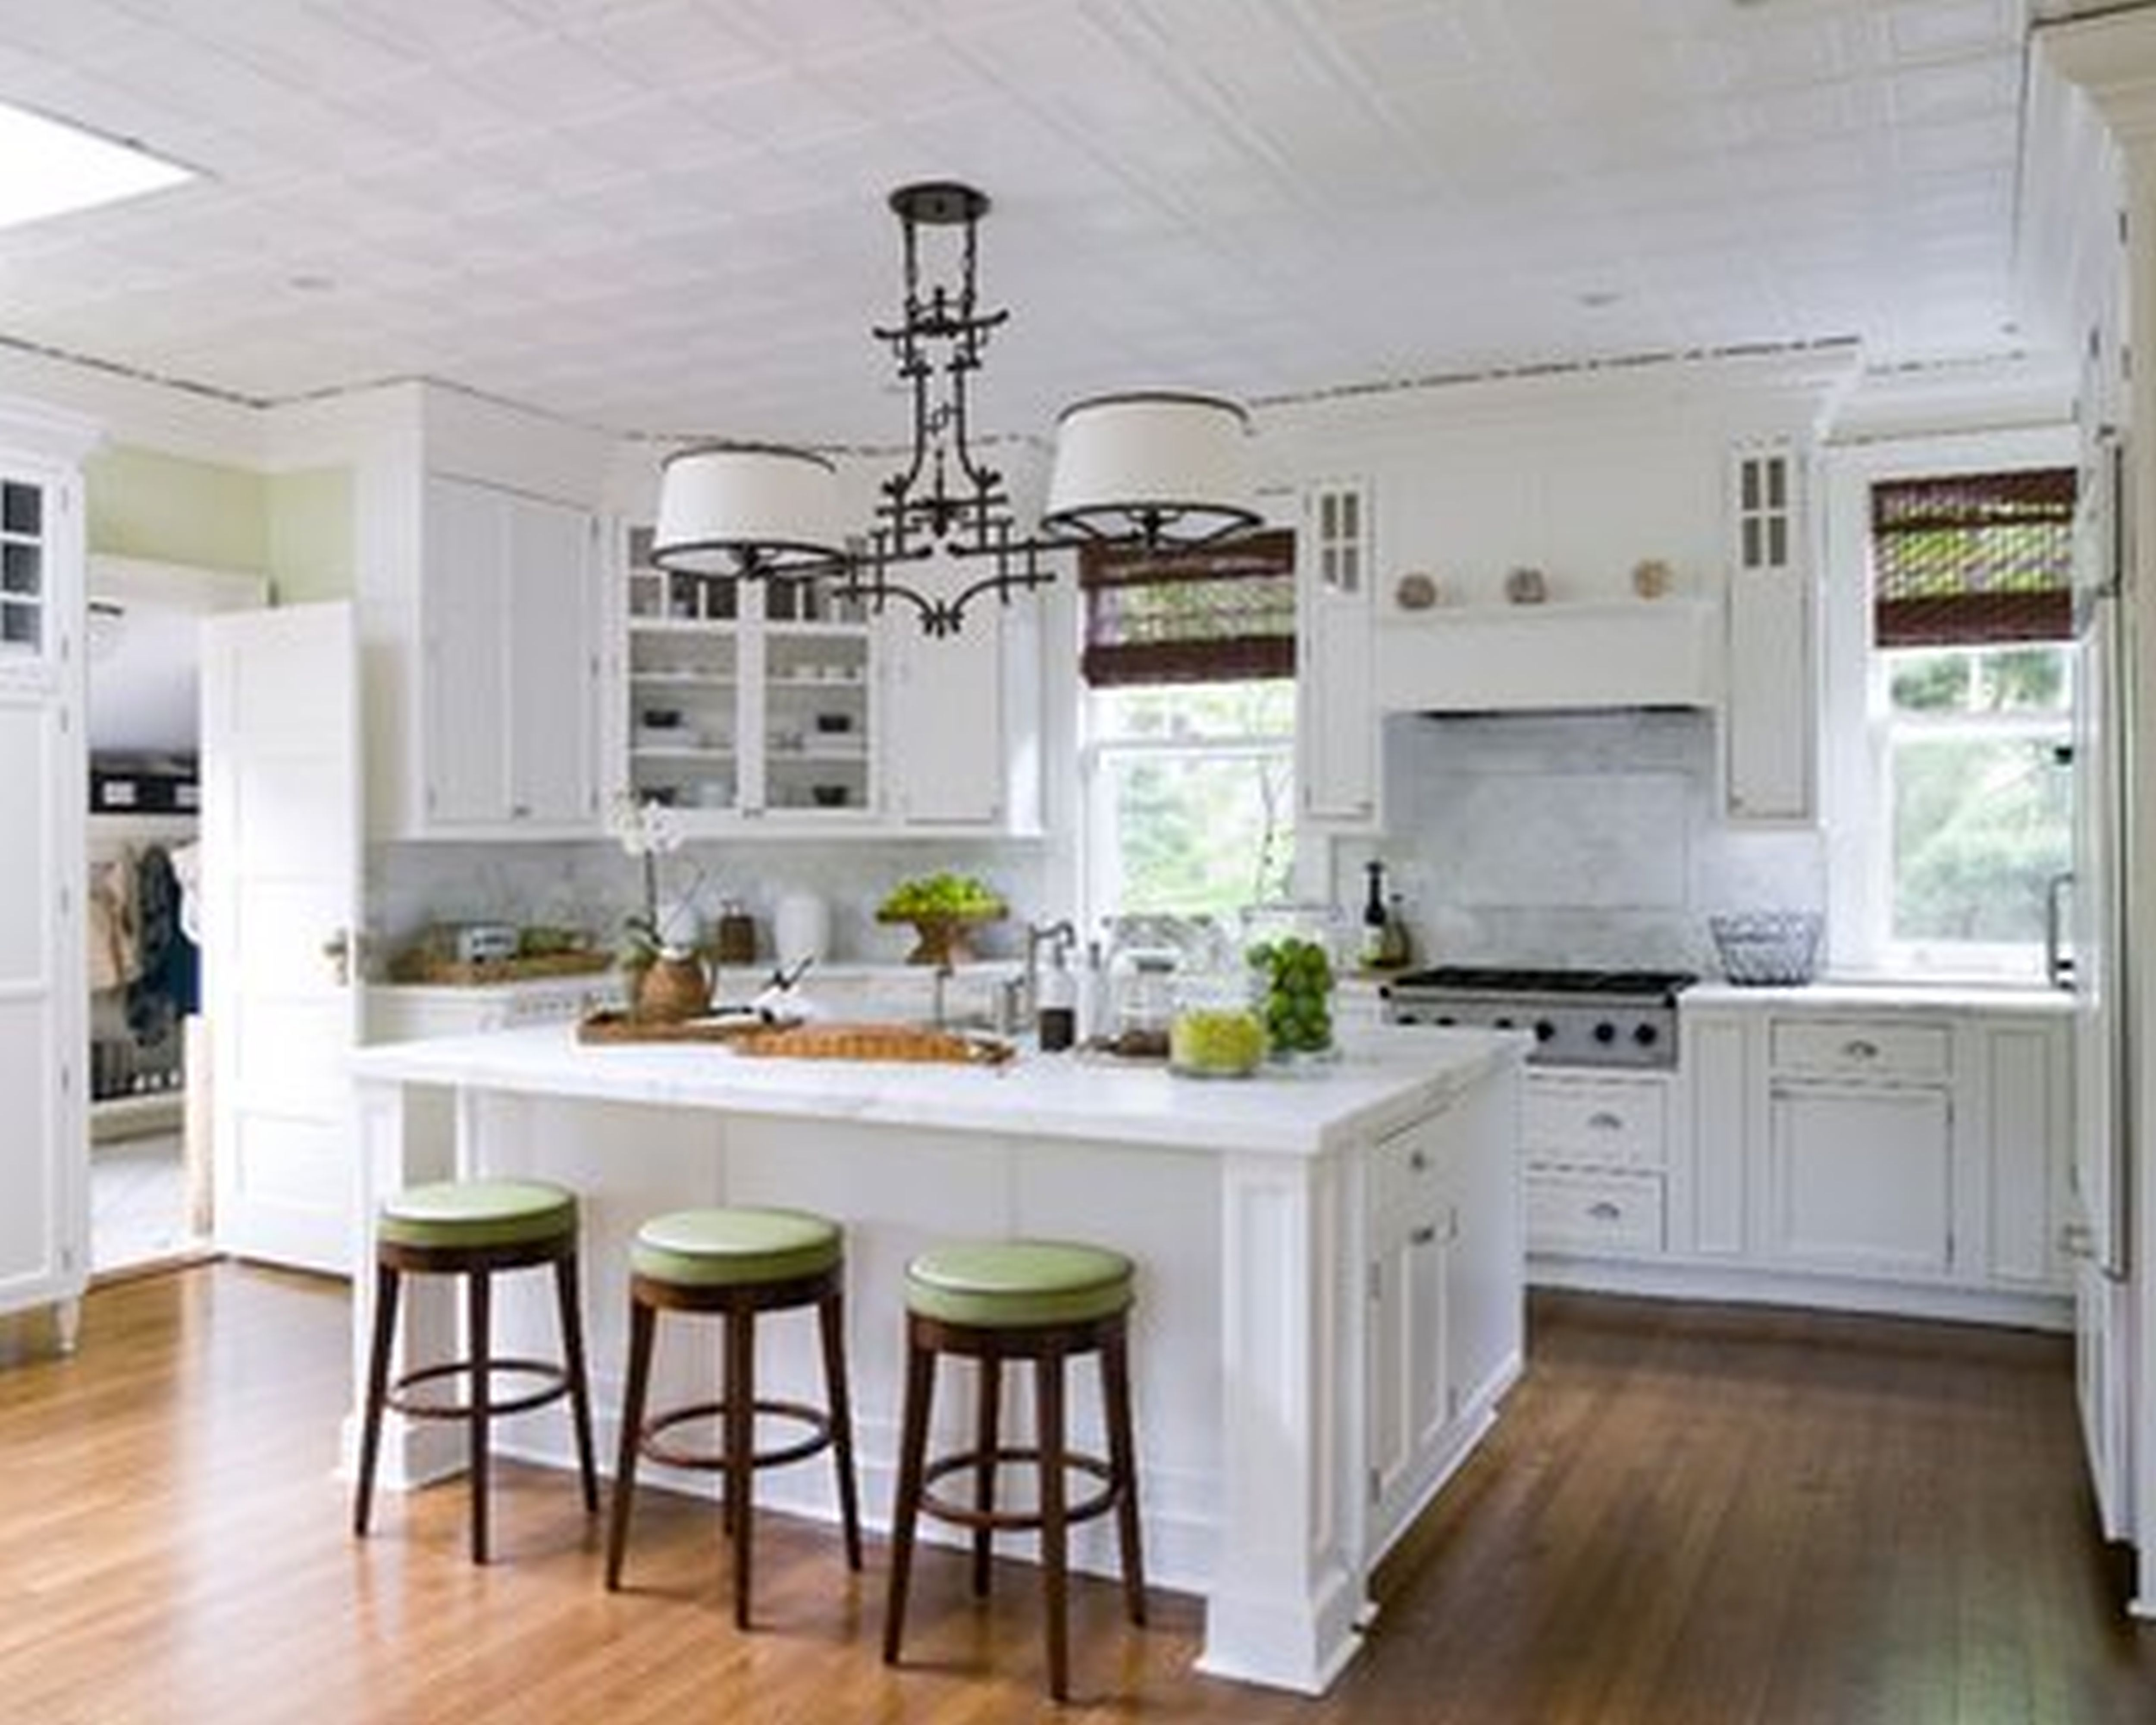 Pin de Tia Carter-Jenkins en Kitchen redesign | Pinterest